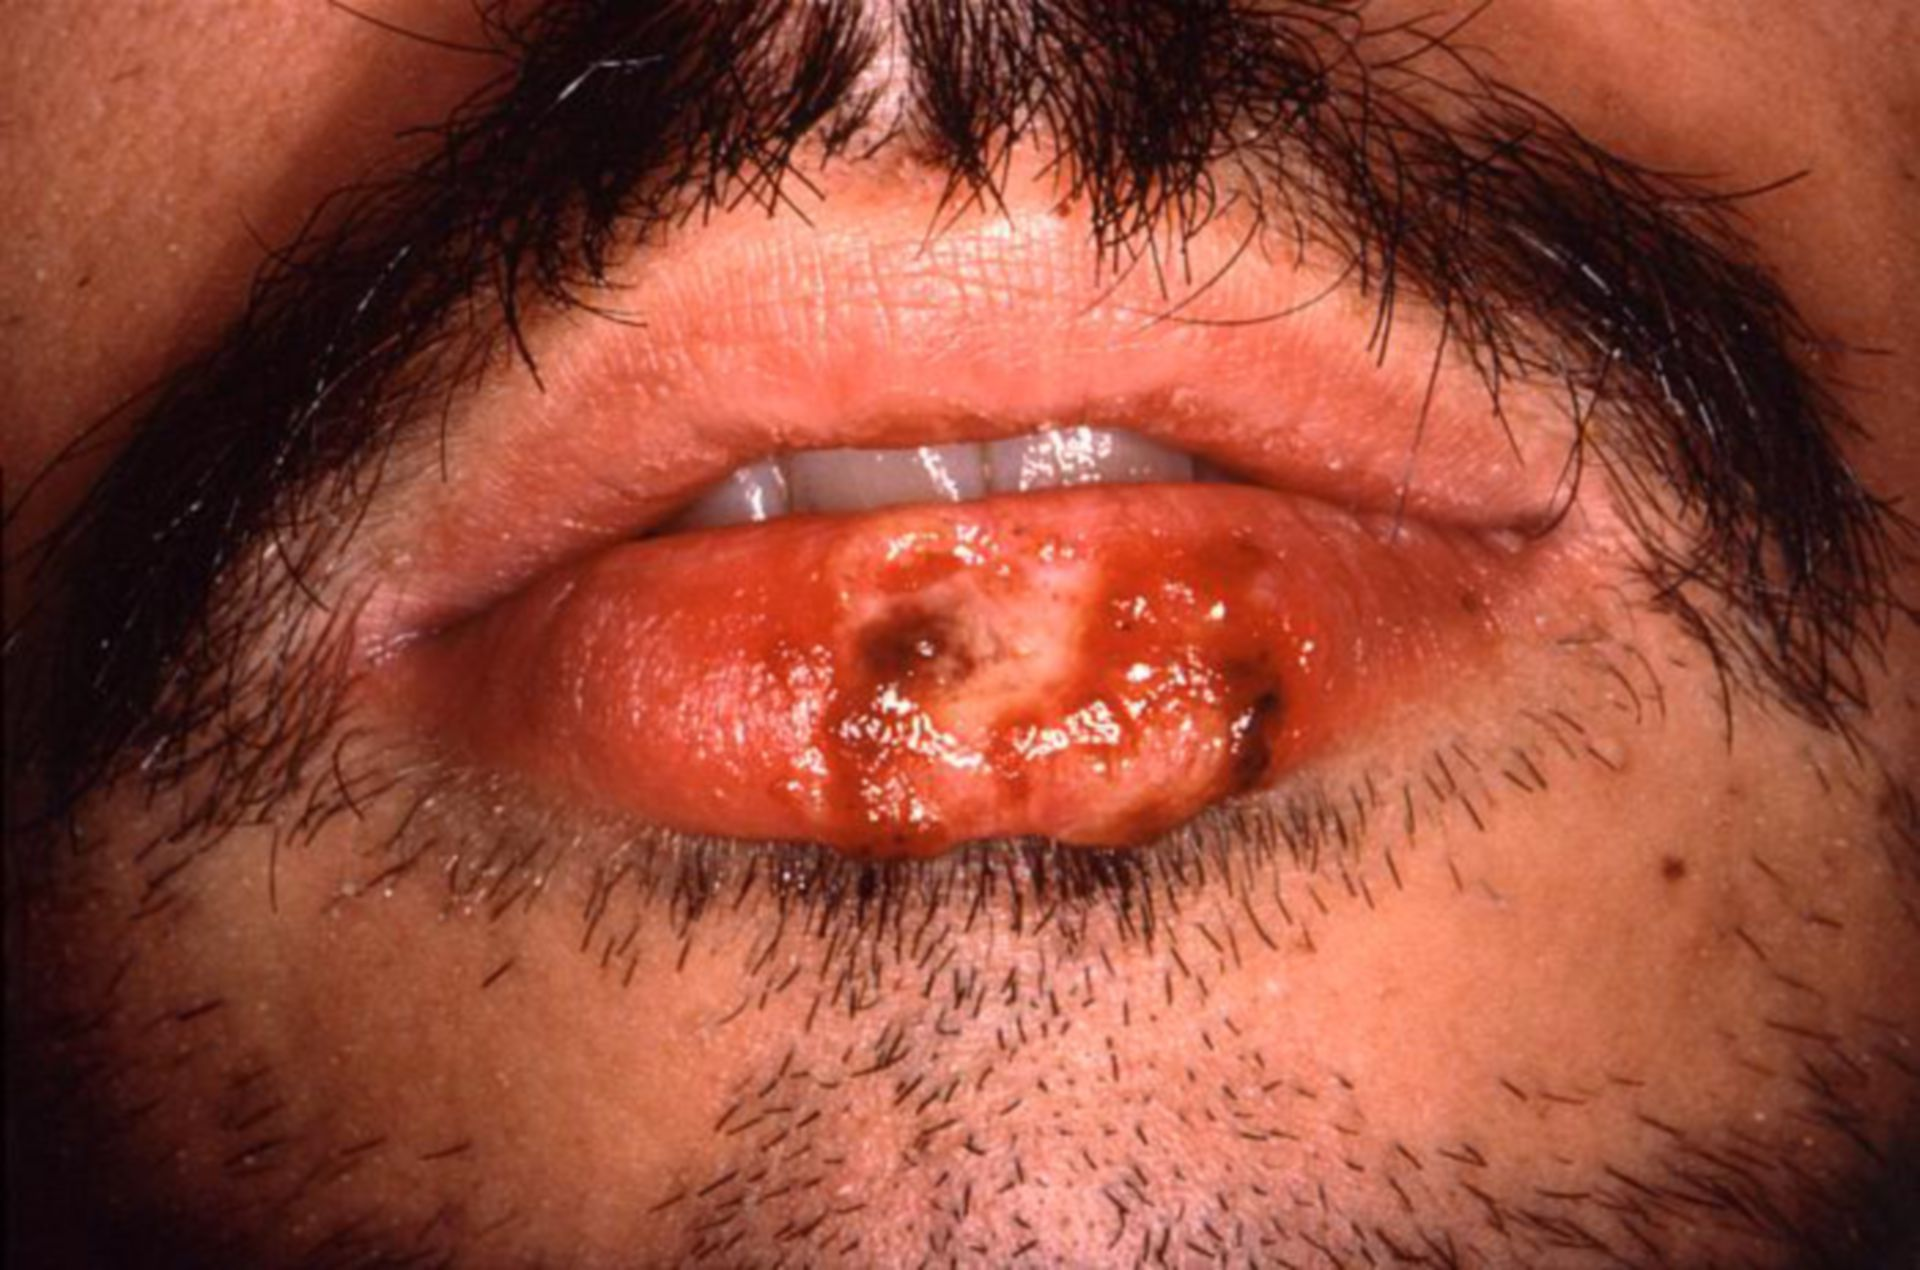 Herpes simplex - mukokutane Läsion